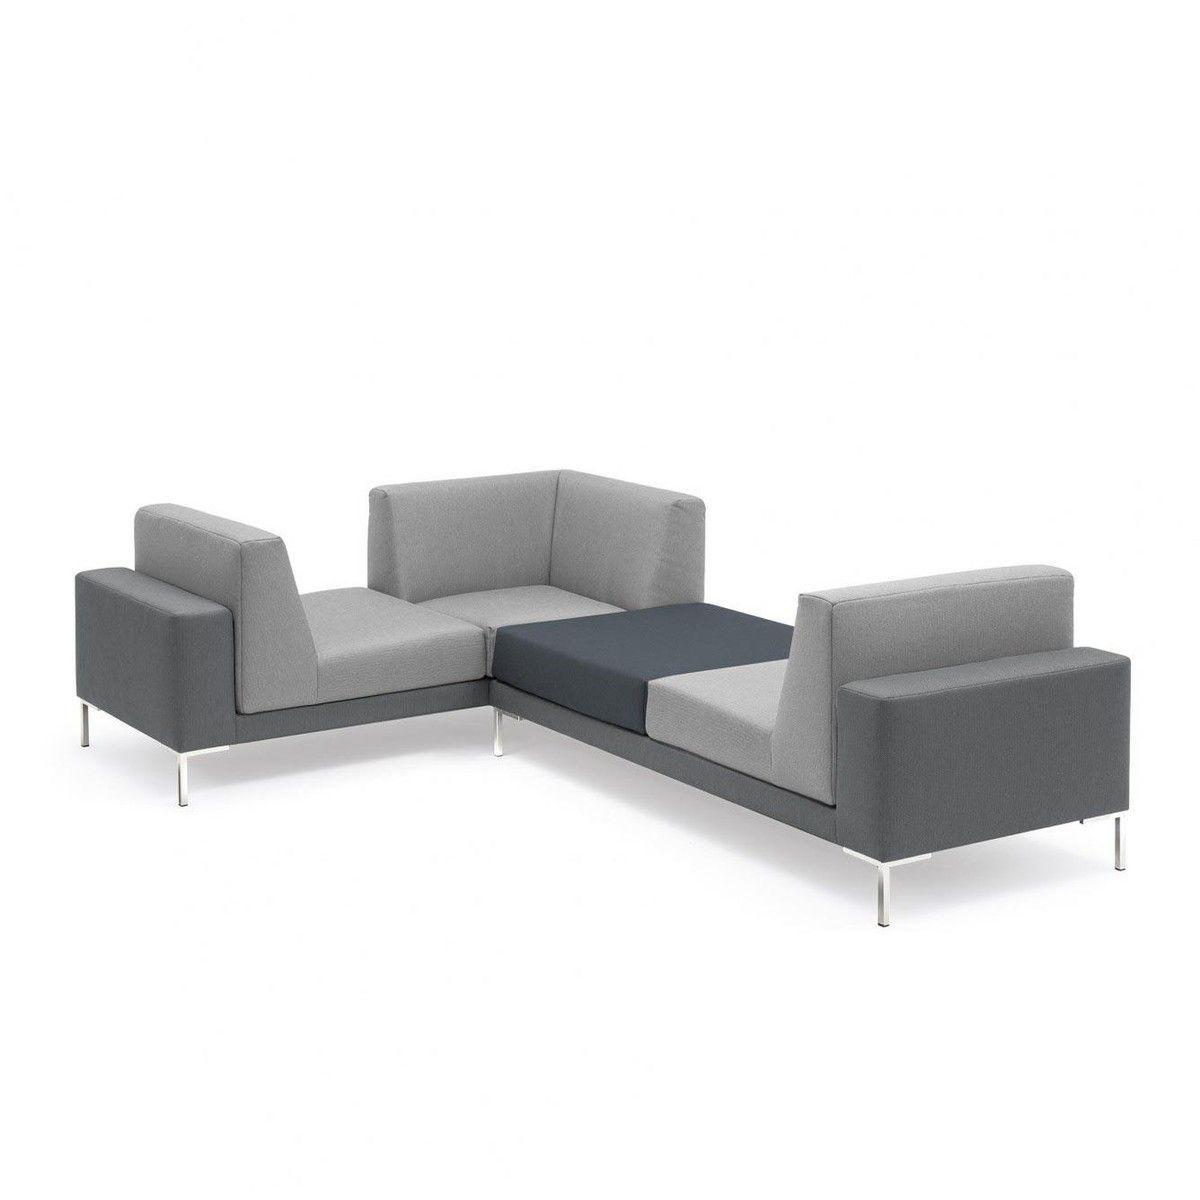 rolf benz grata free rb with rolf benz grata great d. Black Bedroom Furniture Sets. Home Design Ideas